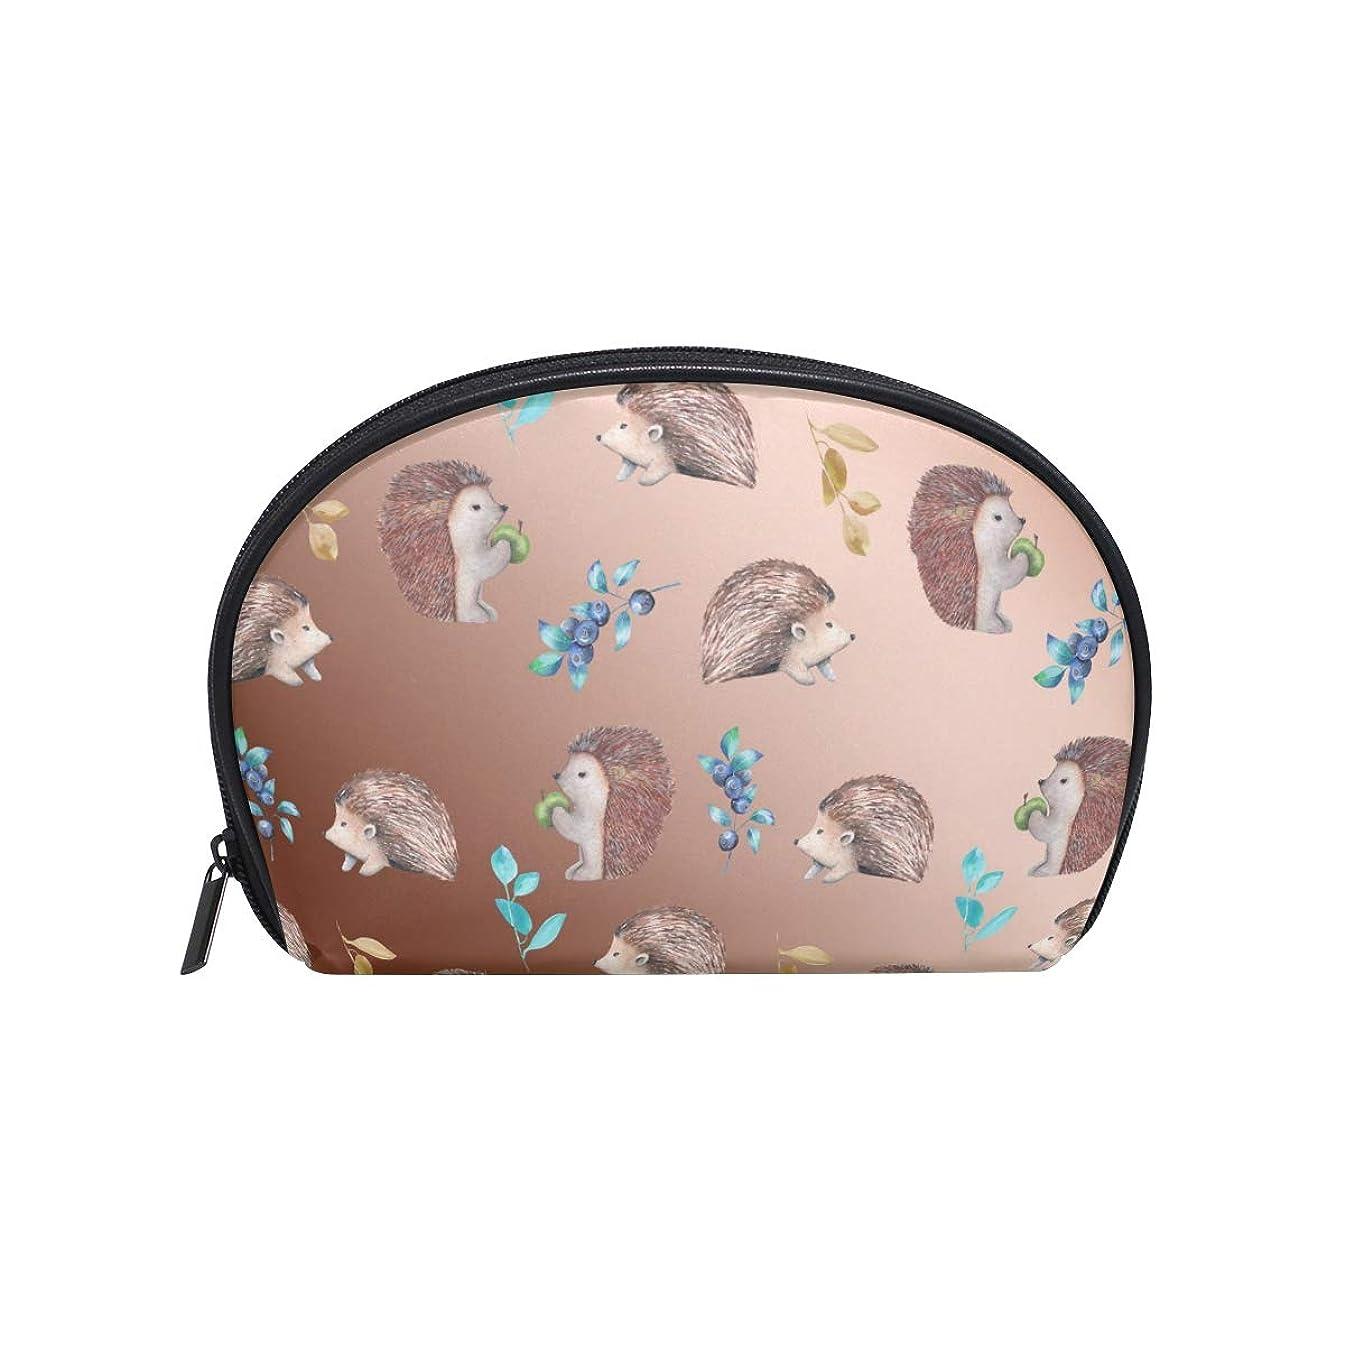 Half Moon Cosmetic Makeup Hedgehog Print Toiletry Bag Pouch Travel Handy Purse Organizer Bag for Women Girls